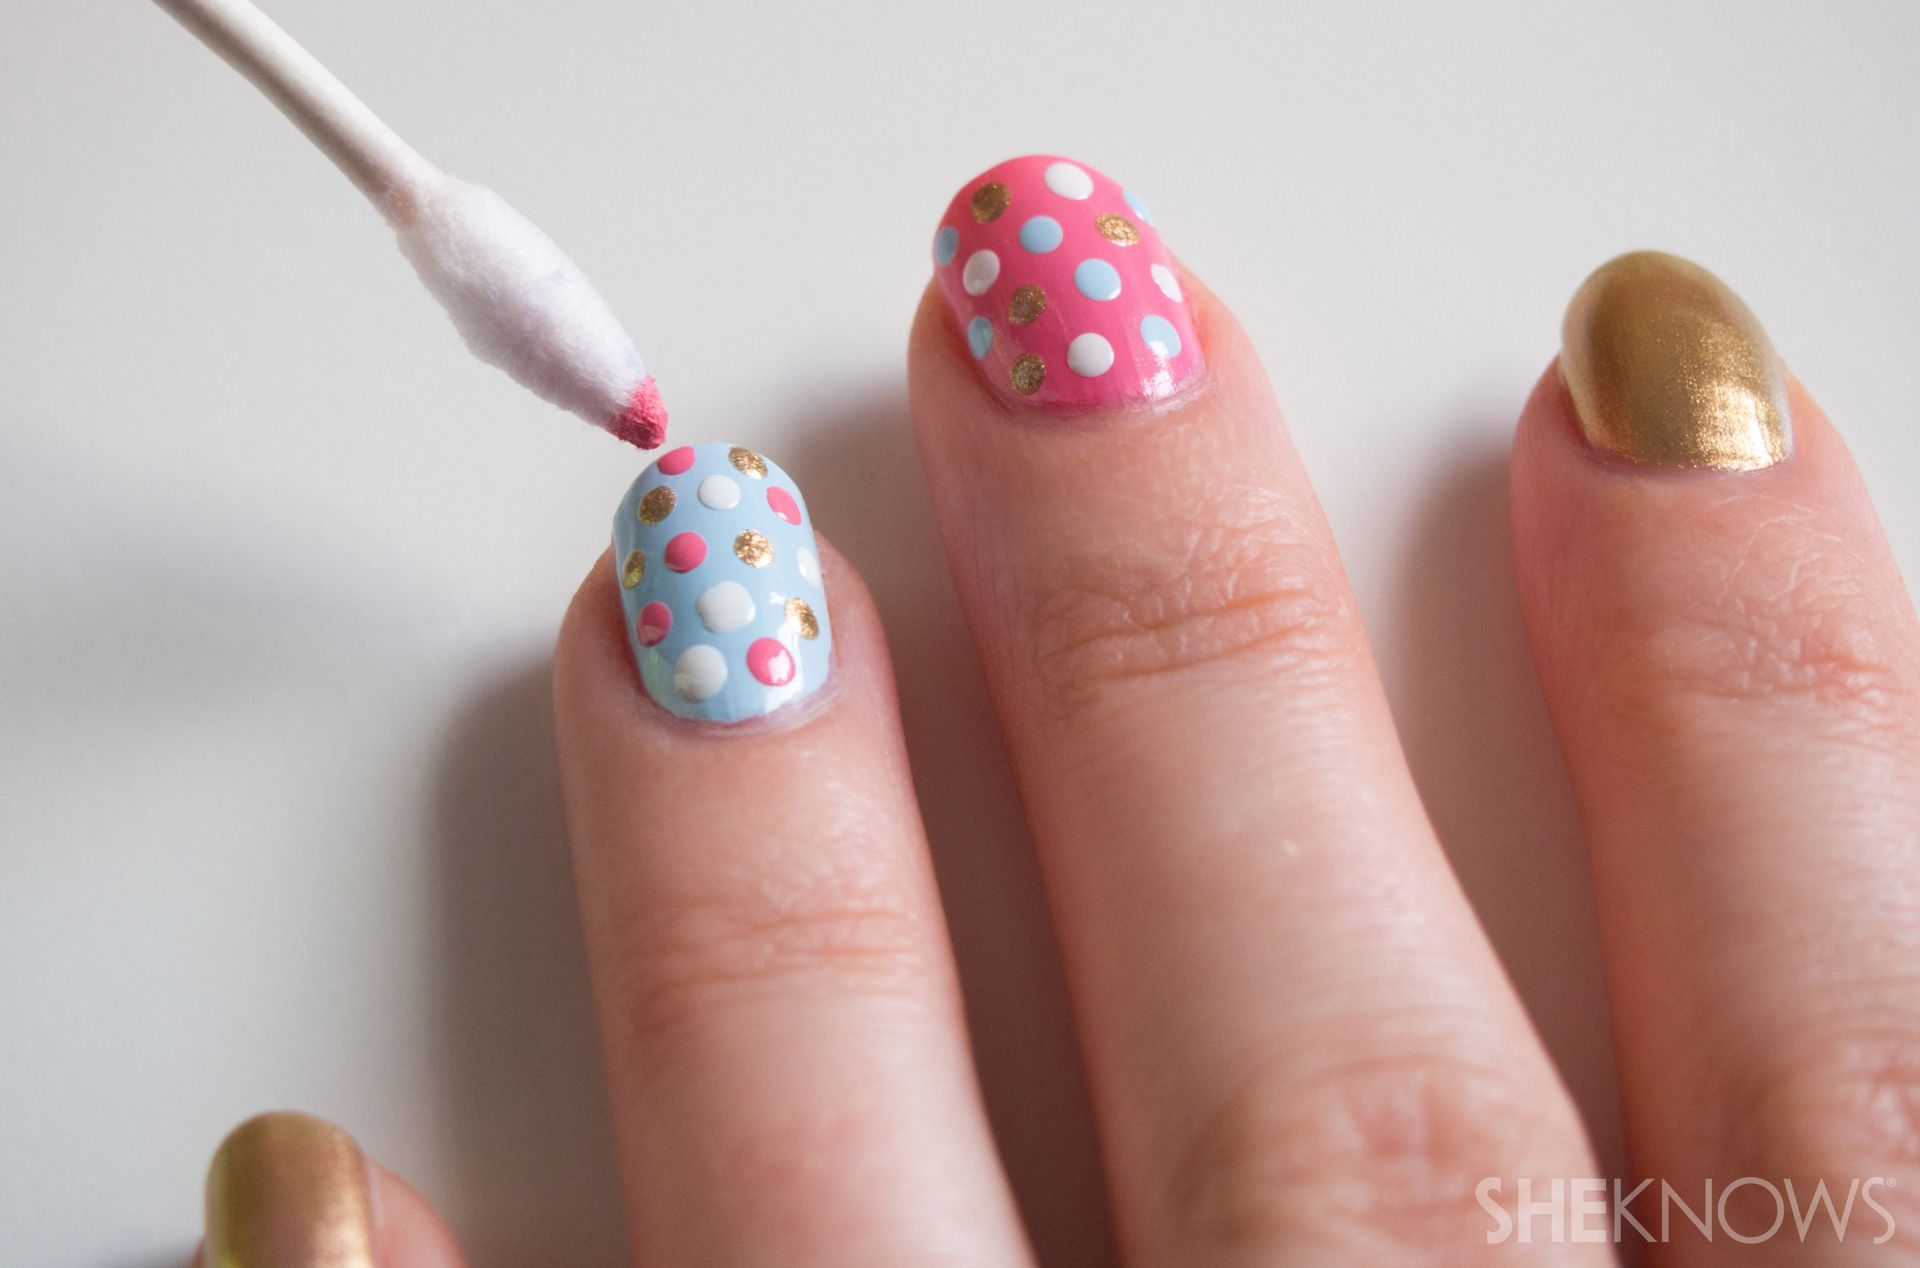 Q-tips™ cotton swabs make this nail design simple   Dot nail art tutorial,  Simple nail designs, Nail designs